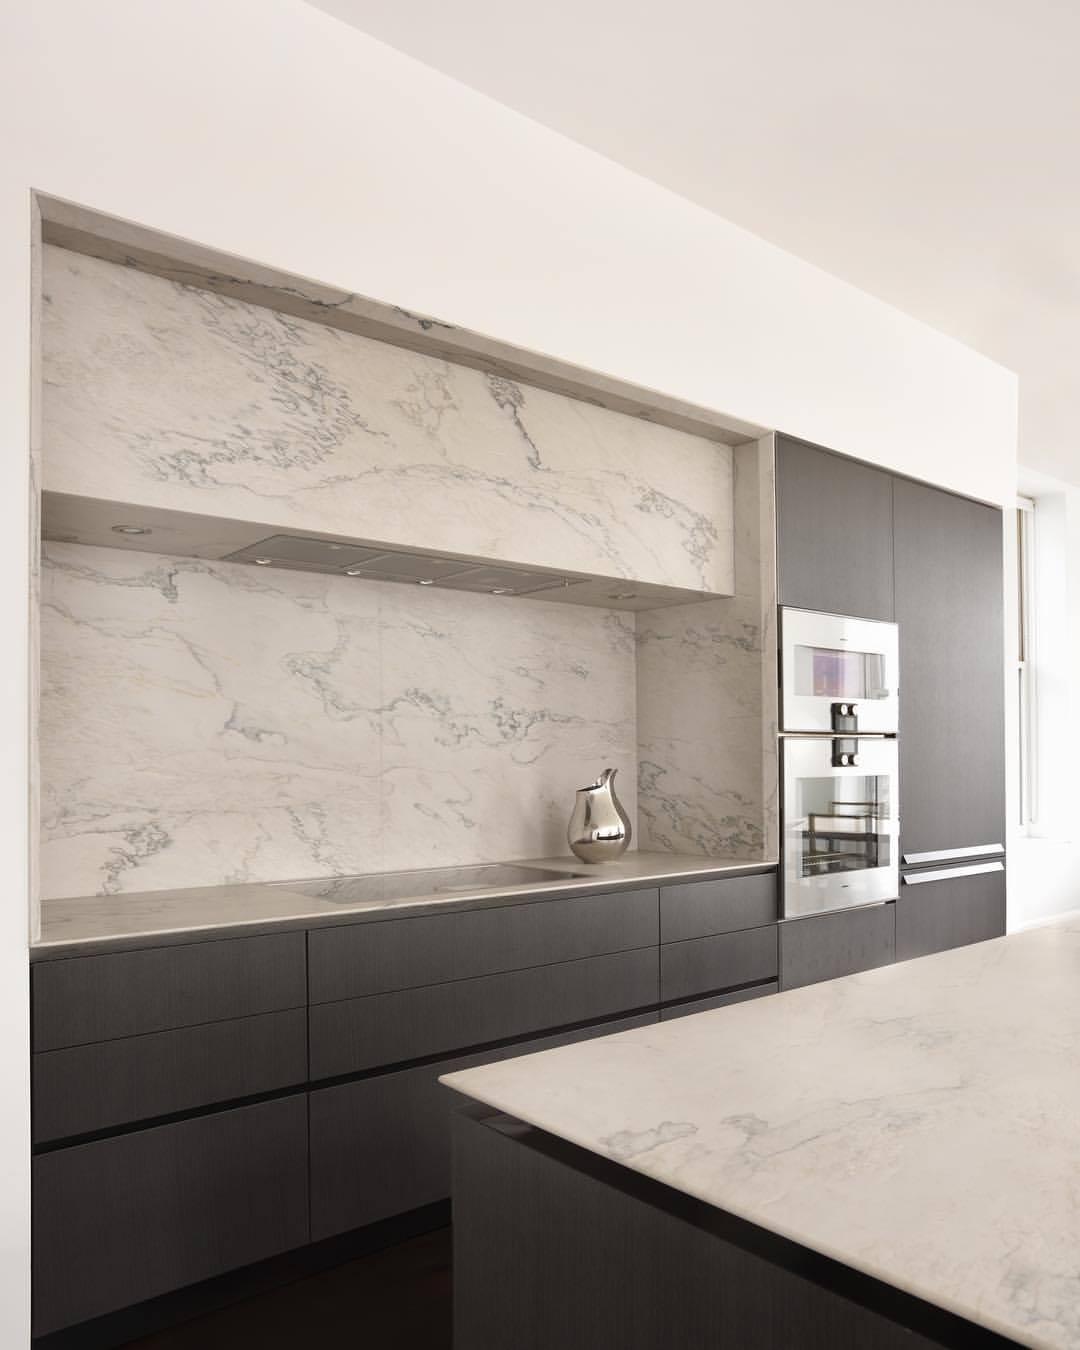 New York Kitchen Design: Designer Italian Kitchen Brand